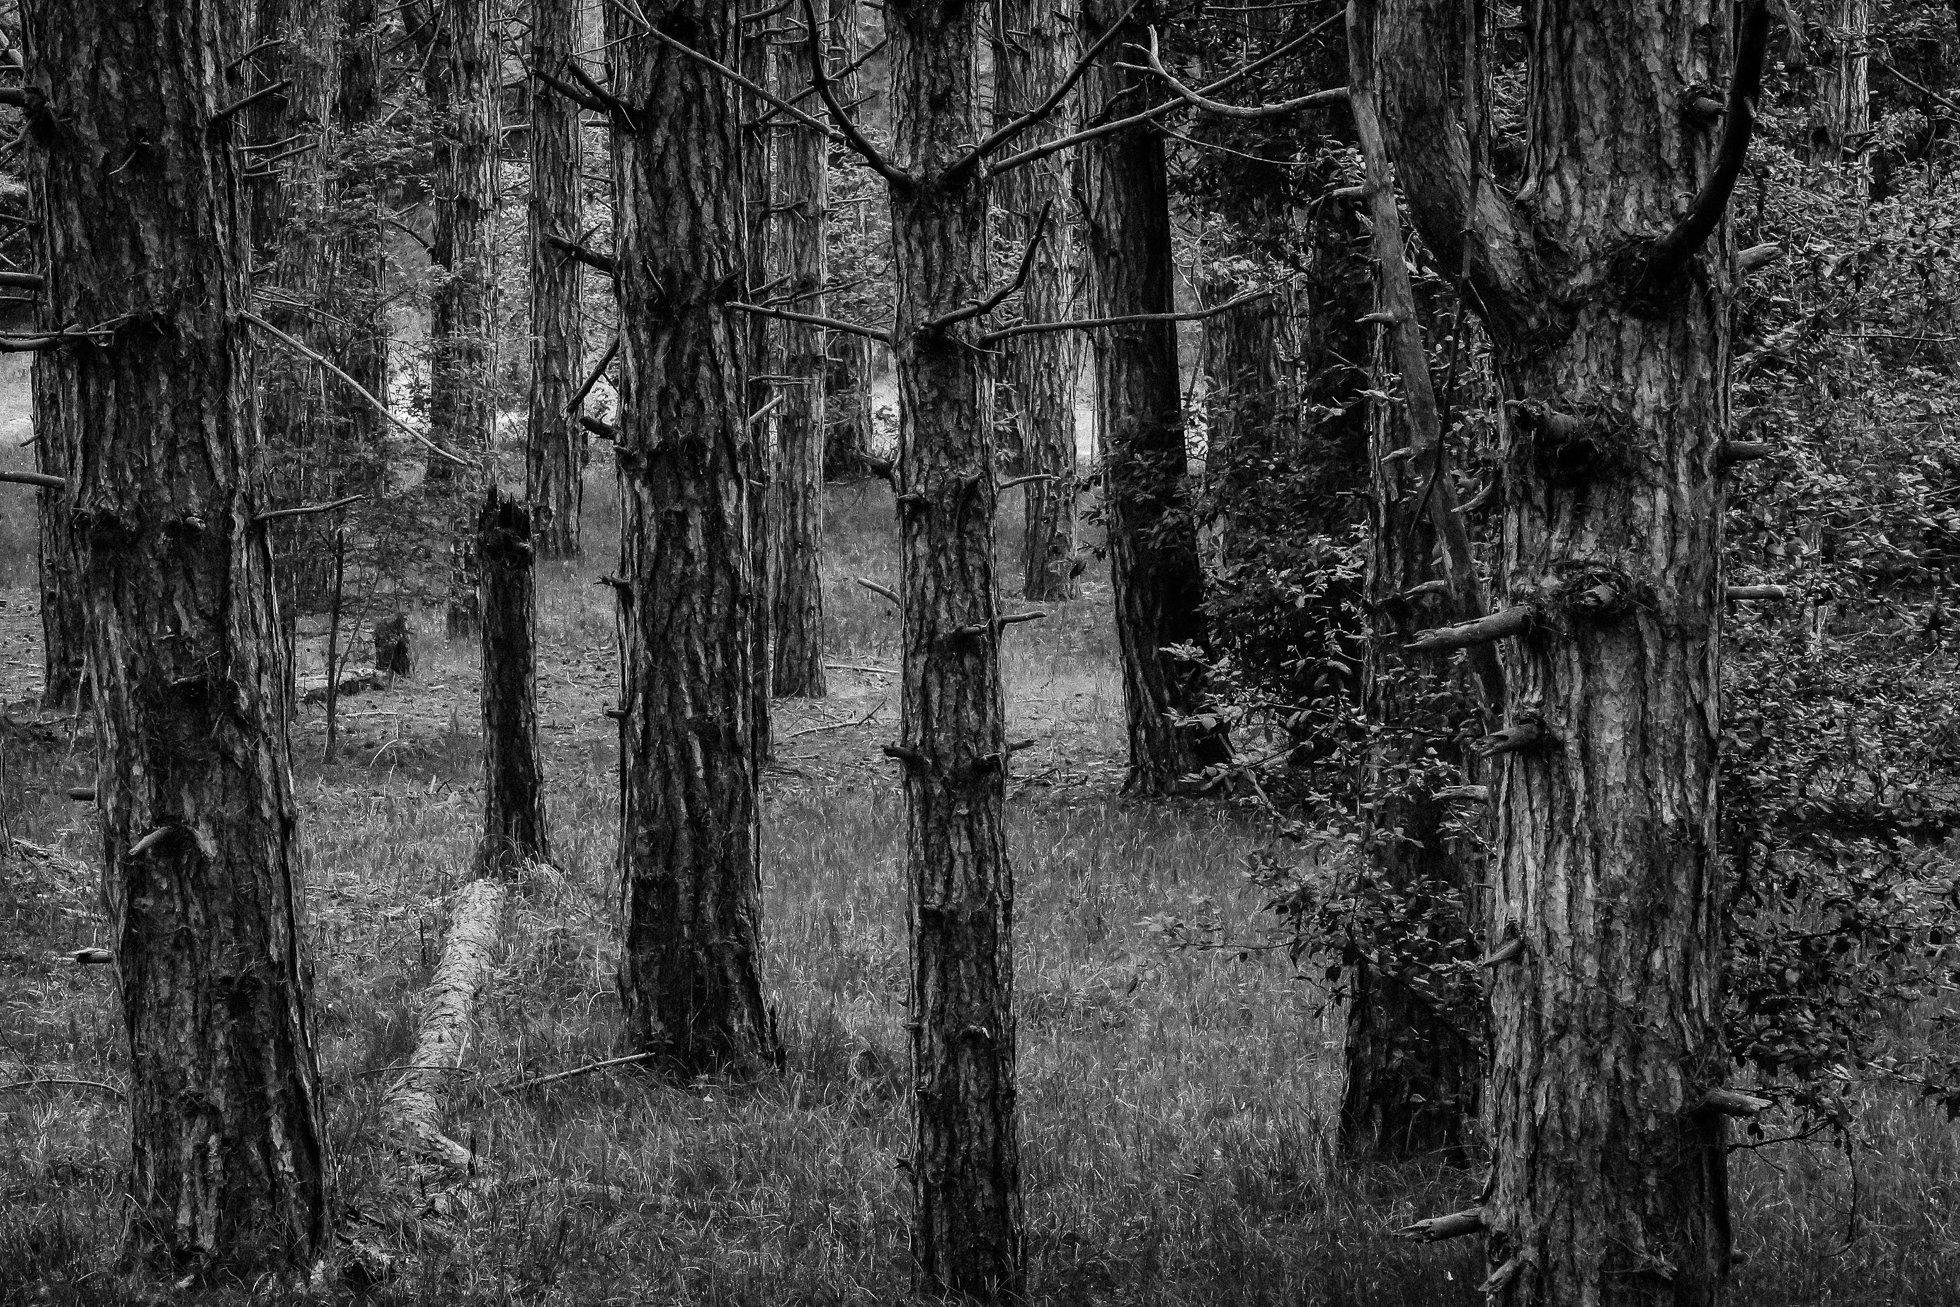 The_Wood-1406.jpg